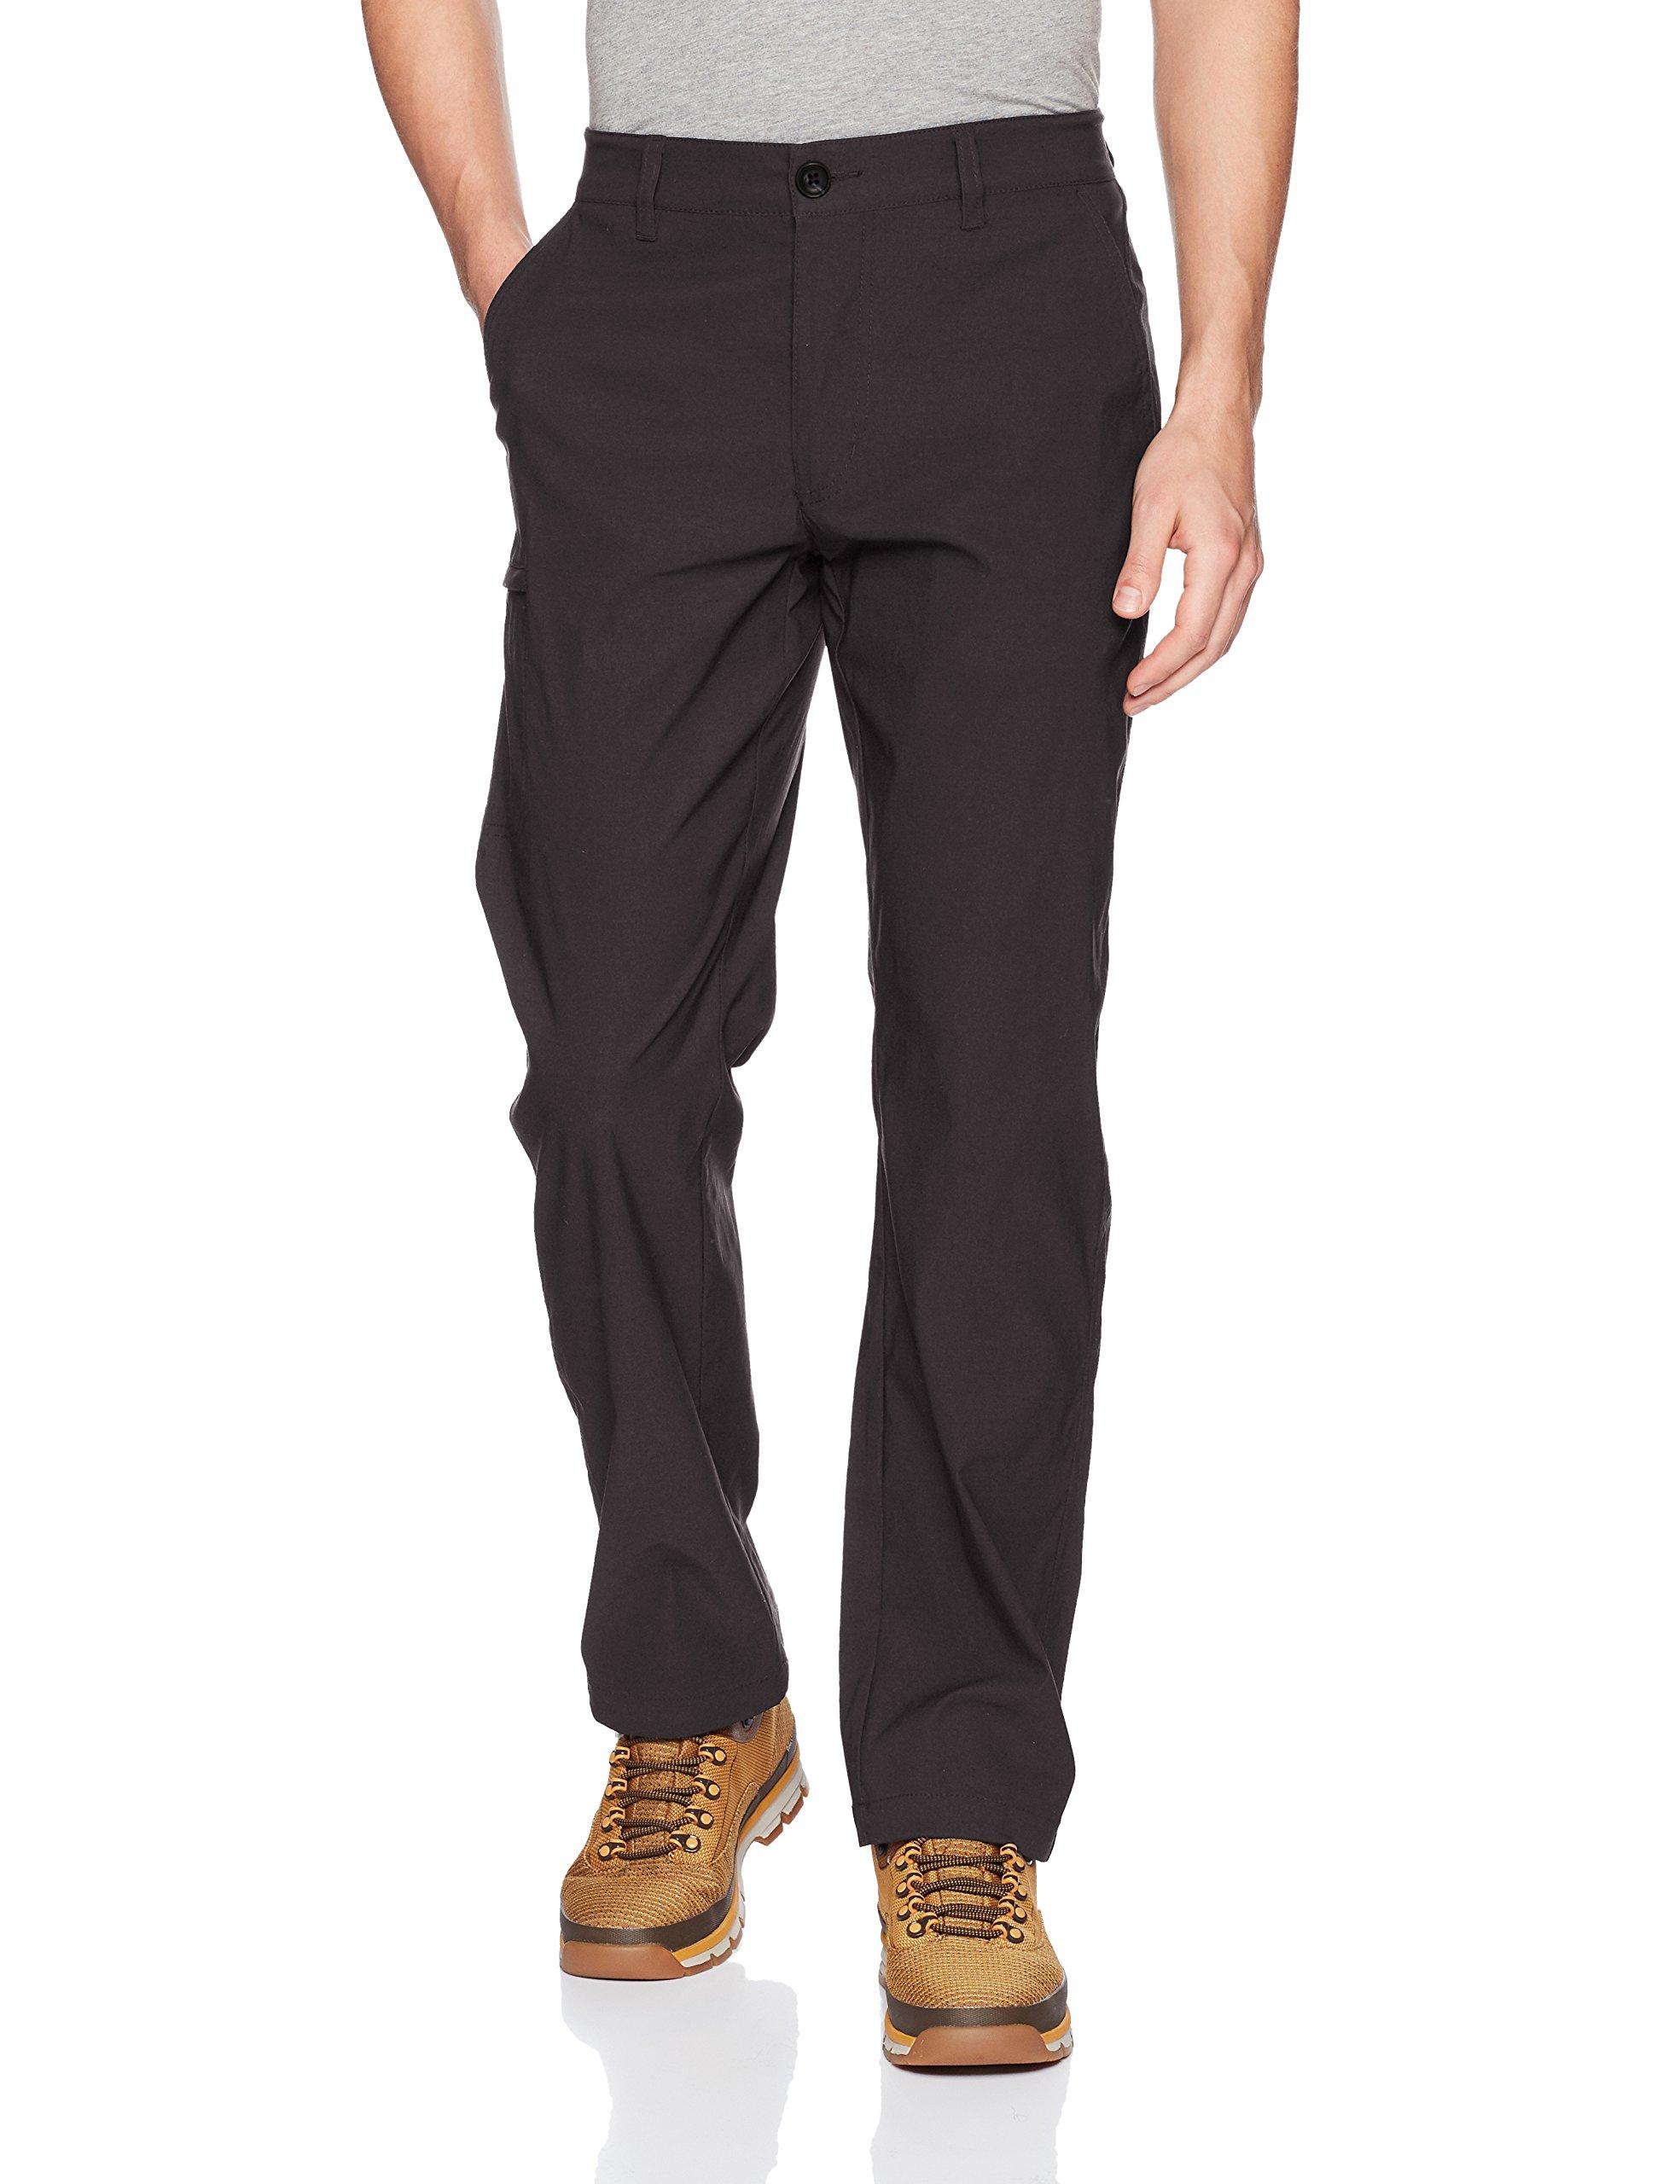 UnionBay Men's Rainier Travel Chino Pants (Charcoal, 32W x 34L)